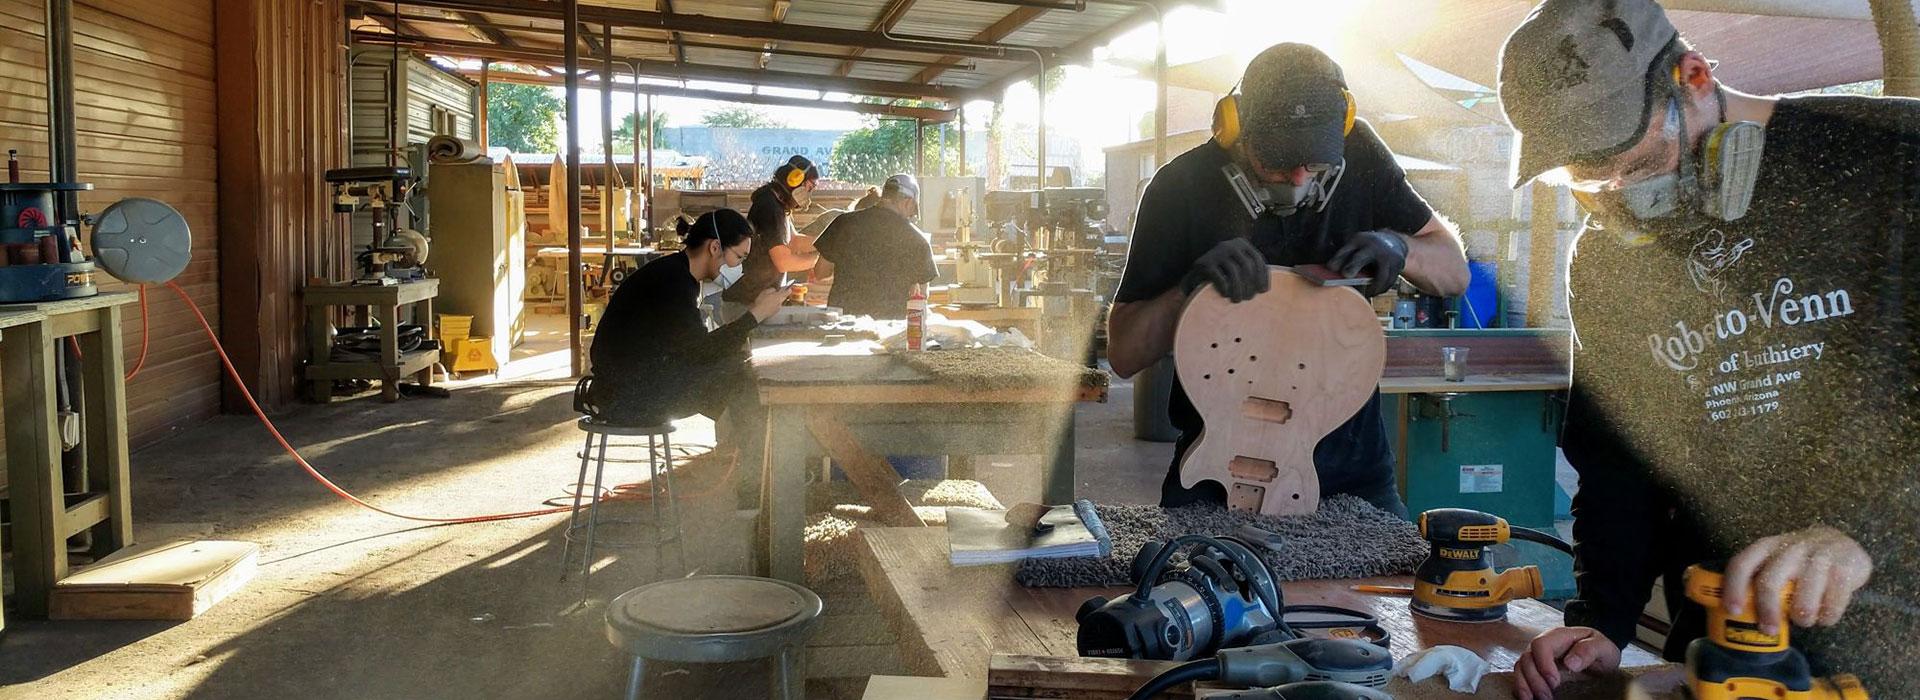 roberto venn guitar making banners img 1415 FAQs